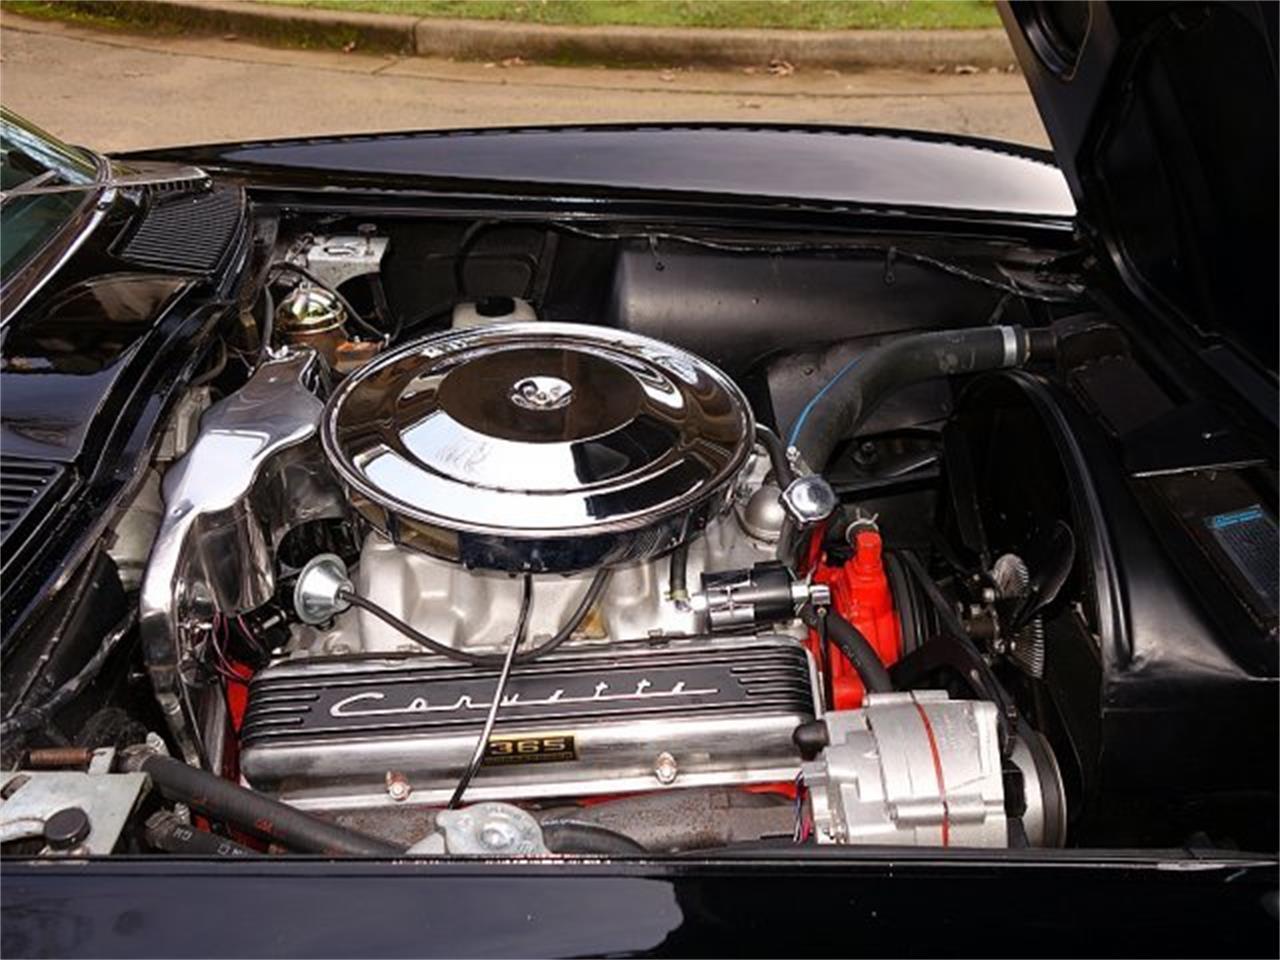 Large Picture of '64 Corvette located in Oregon - $59,900.00 - PNWW